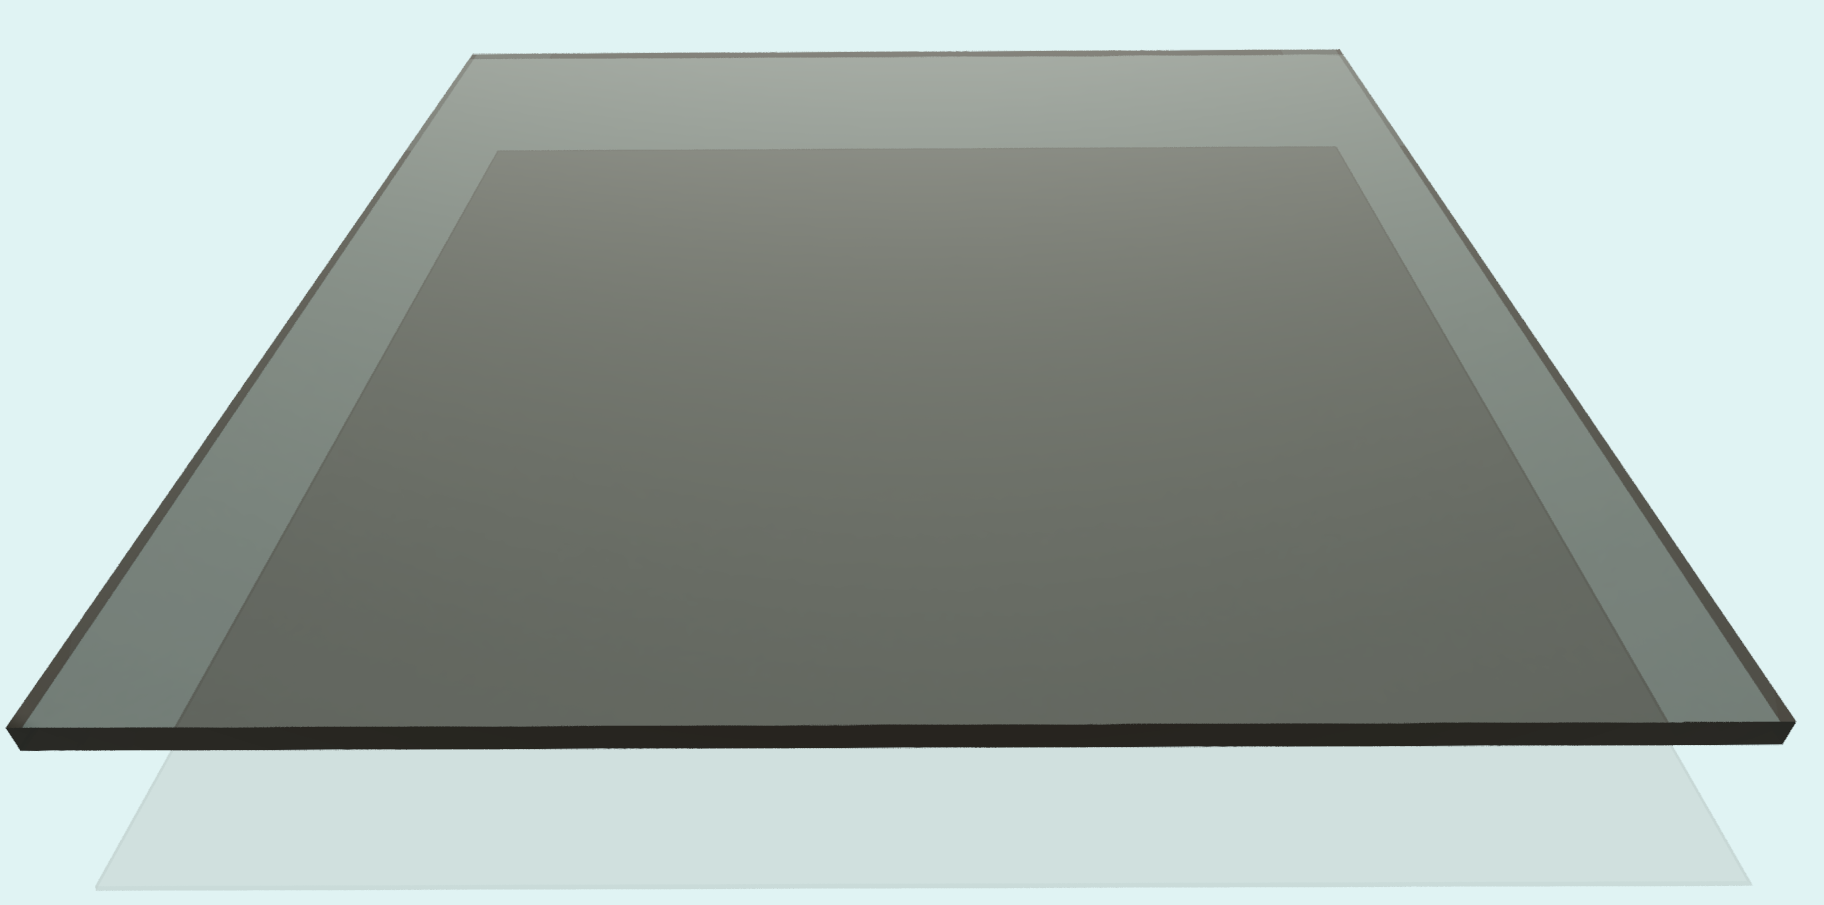 Polycarbonat 4mm rauchfarben